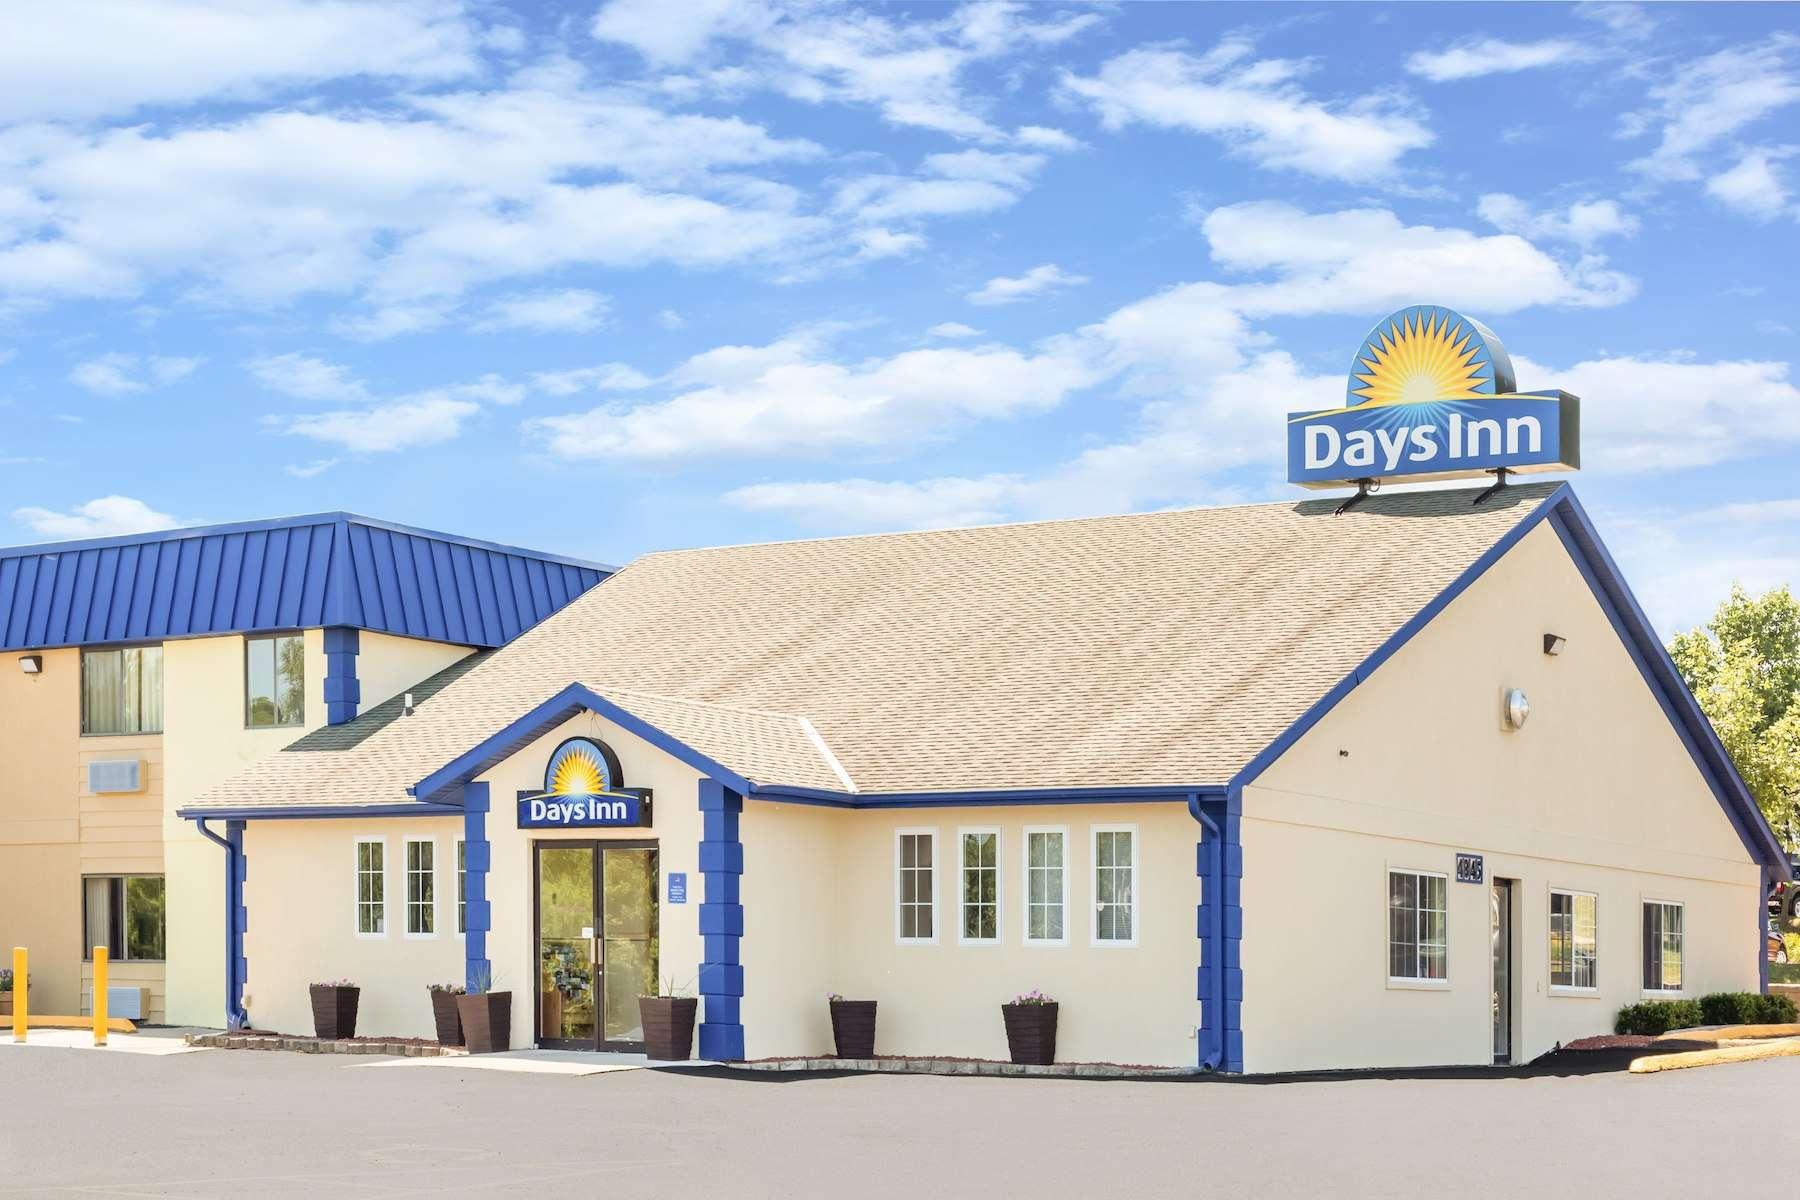 Days Inn Merle Hay Des Moines Ia Paramount Lodging Advisors